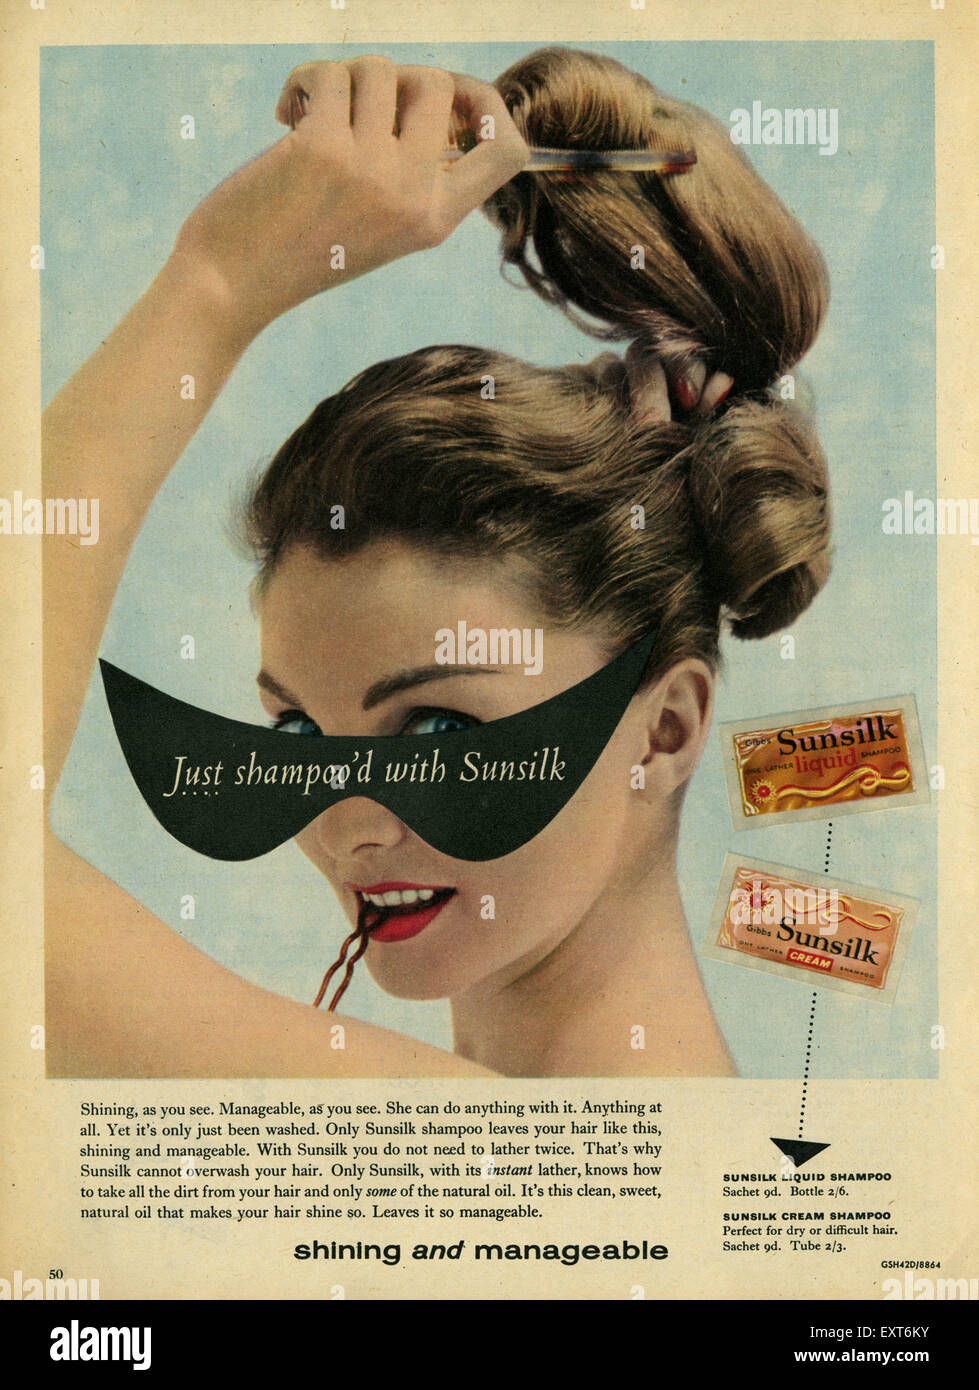 Sunsilk Stock Photos & Sunsilk Stock Images - Alamy